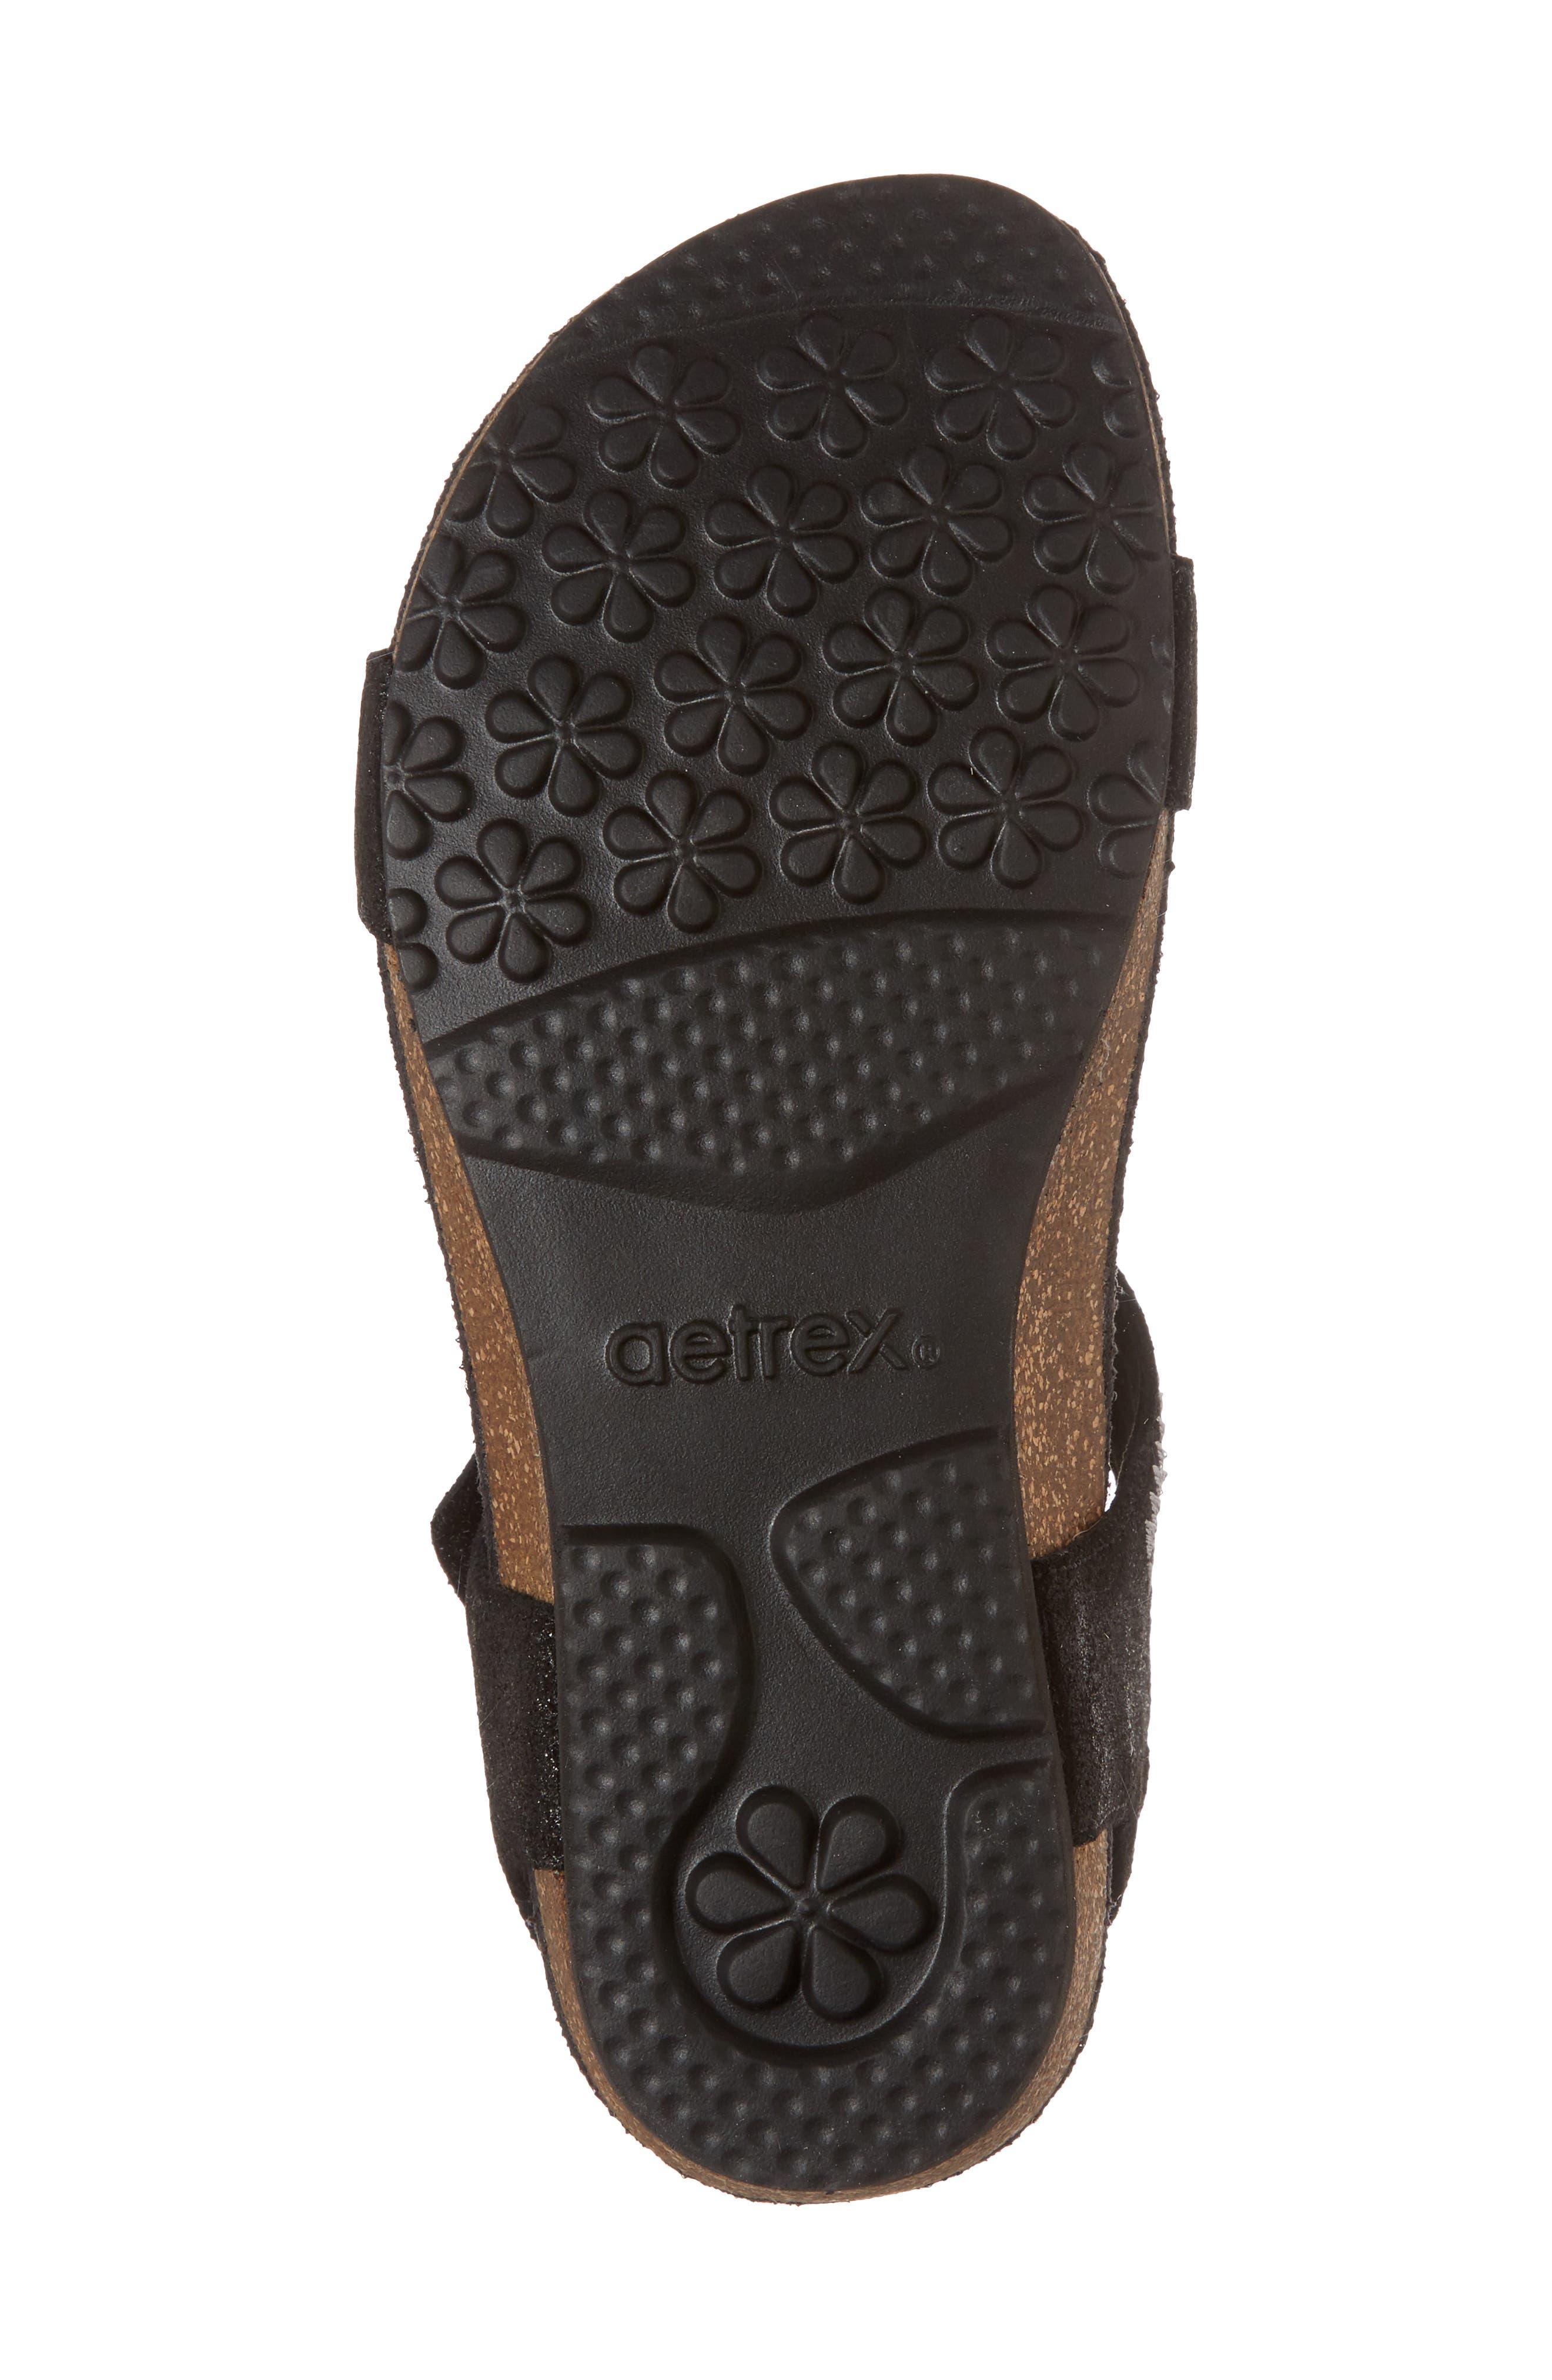 Capri Wedge Sandal,                             Alternate thumbnail 6, color,                             001